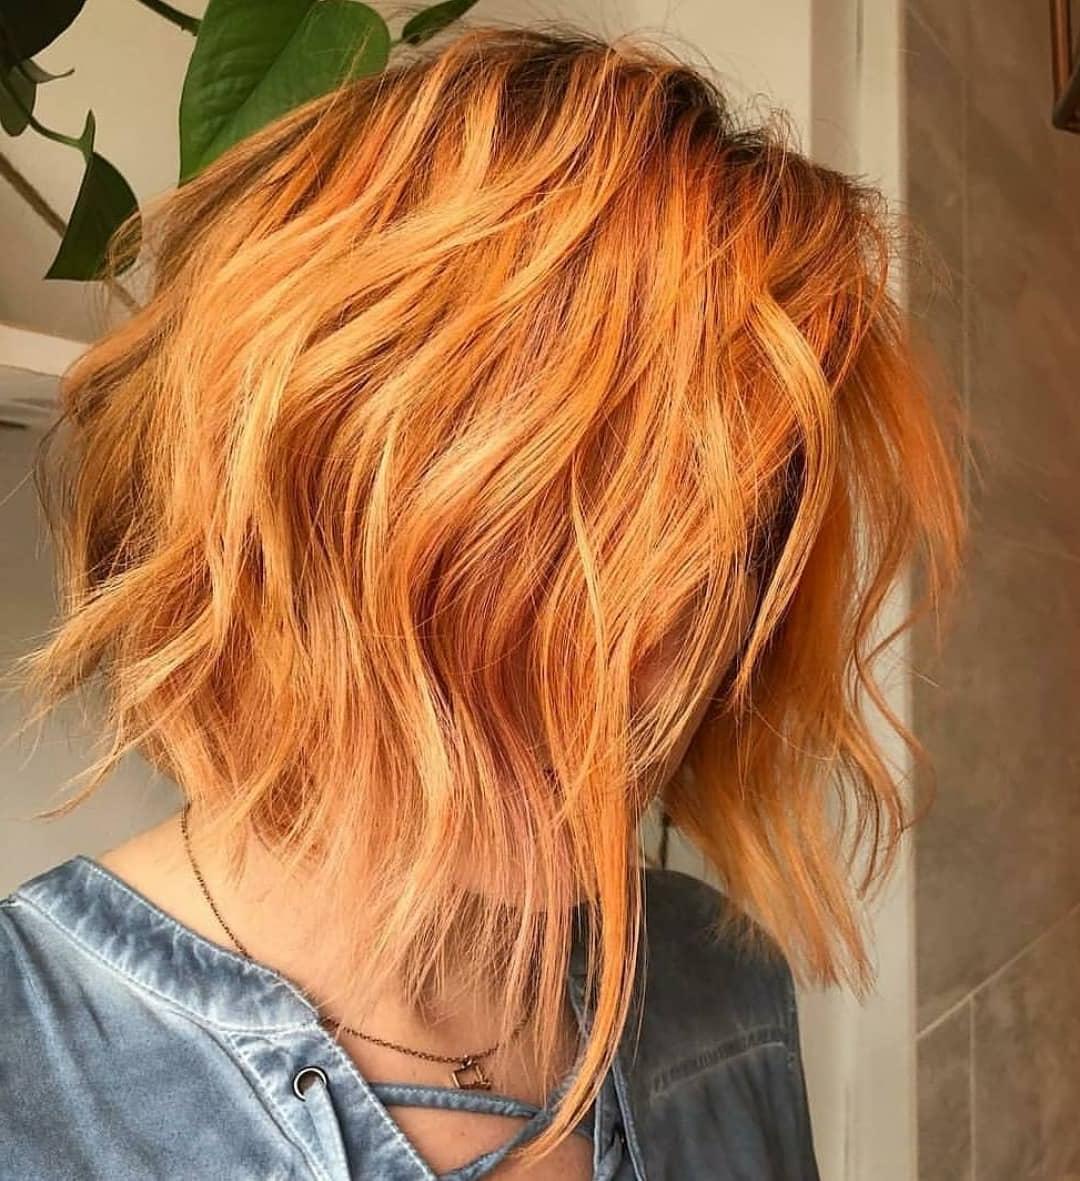 10 Trendy Choppy Lob Haircuts For Women, Best Medium Hair With Regard To Voluminous Short Choppy Blonde Bob Hairstyles (View 16 of 20)